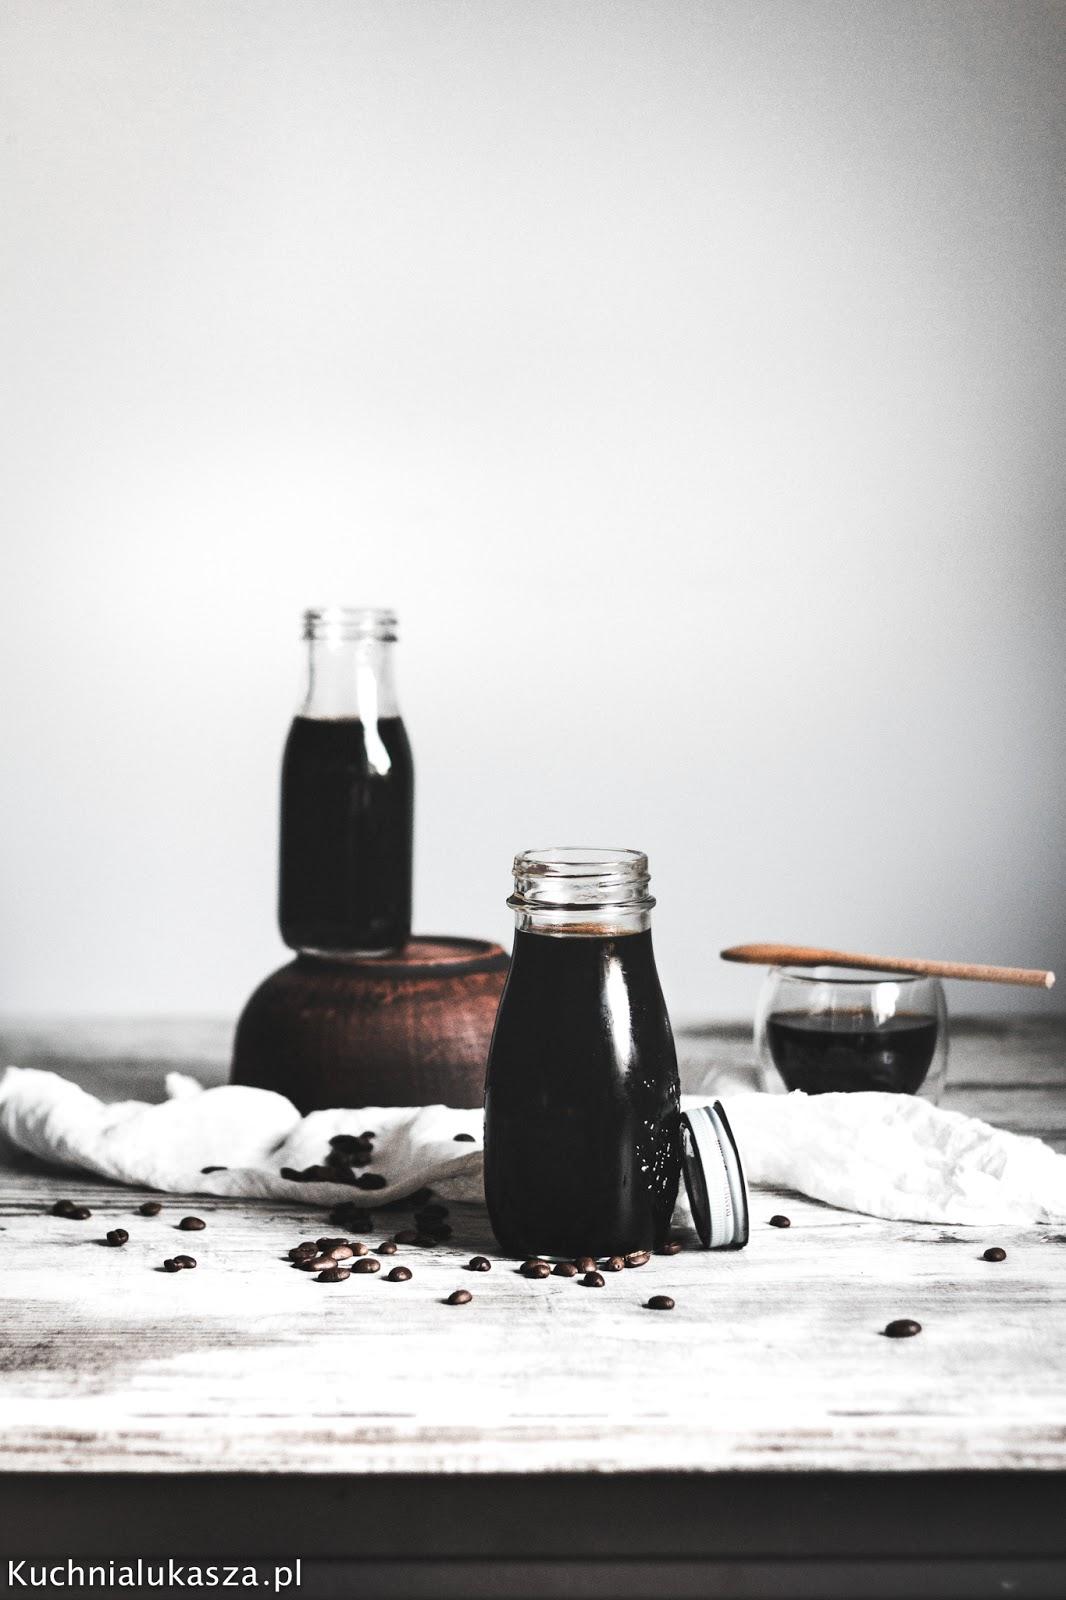 Kuchnia Lukasza - COLD BREW PRZEPIS